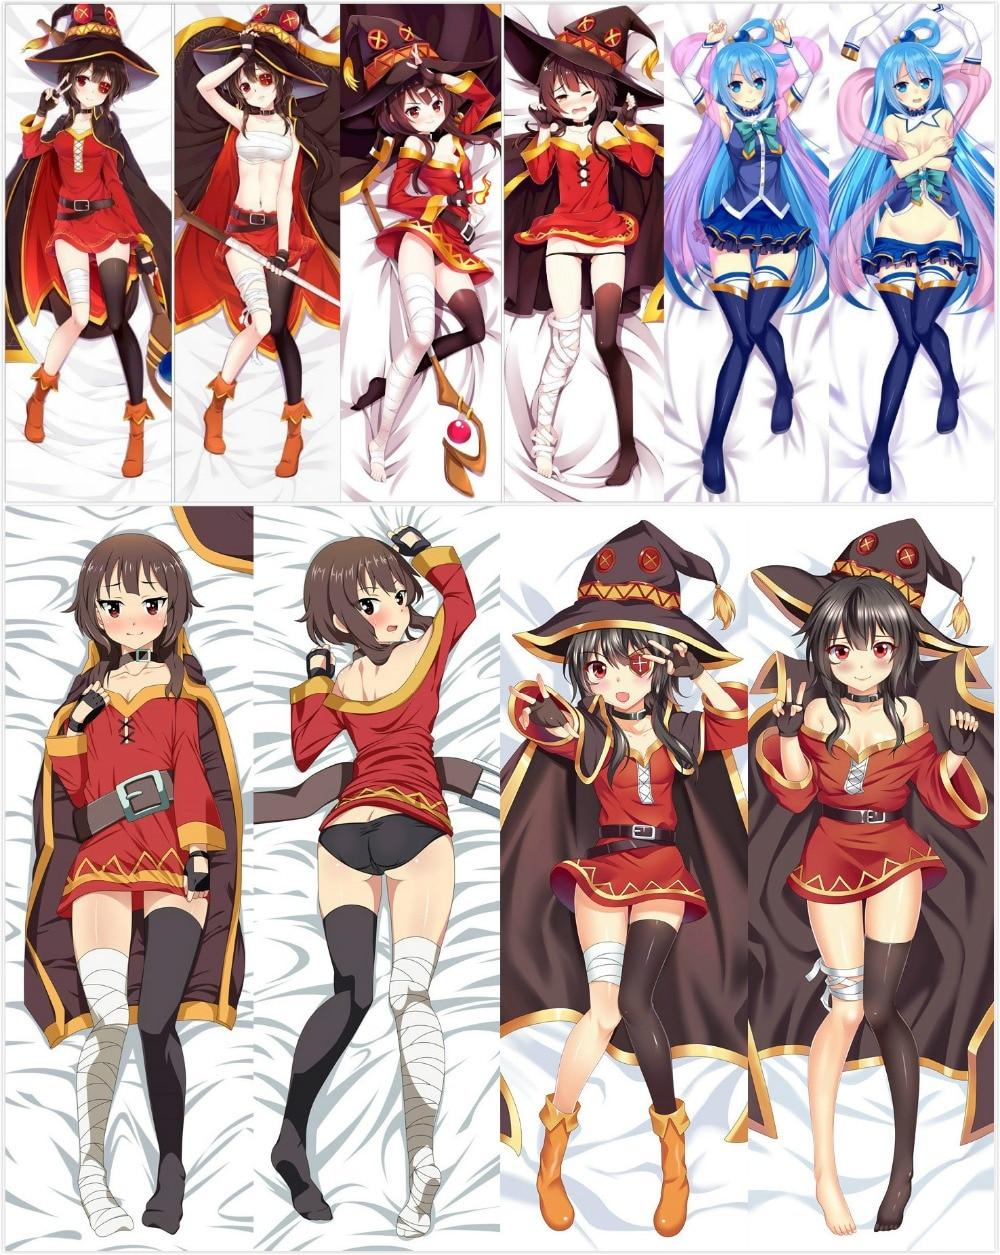 New KonoSuba Dakimakura Megumin Anime Hugging Body Pillow Case Covers